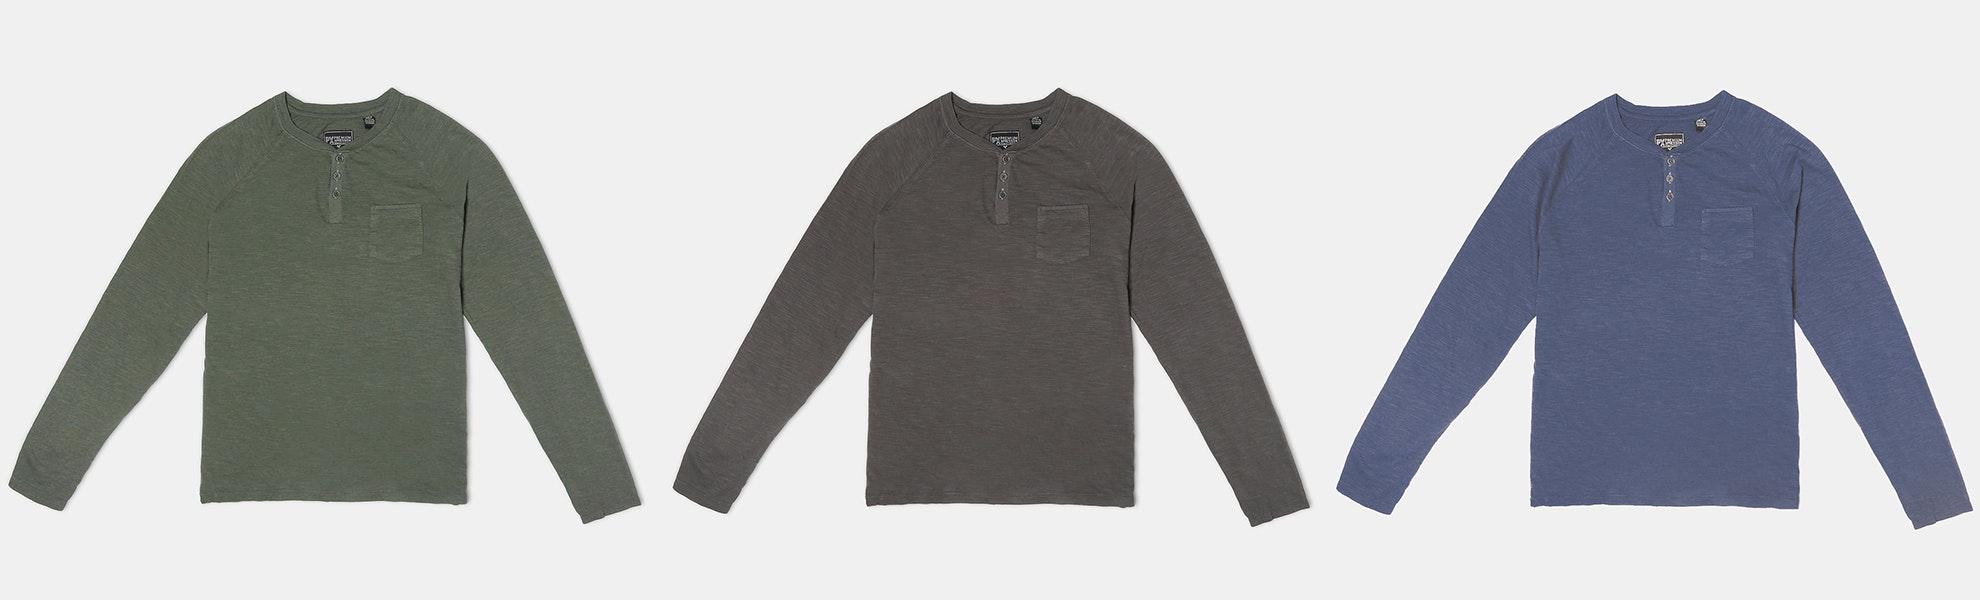 PX Clothing Nate Slub Henley